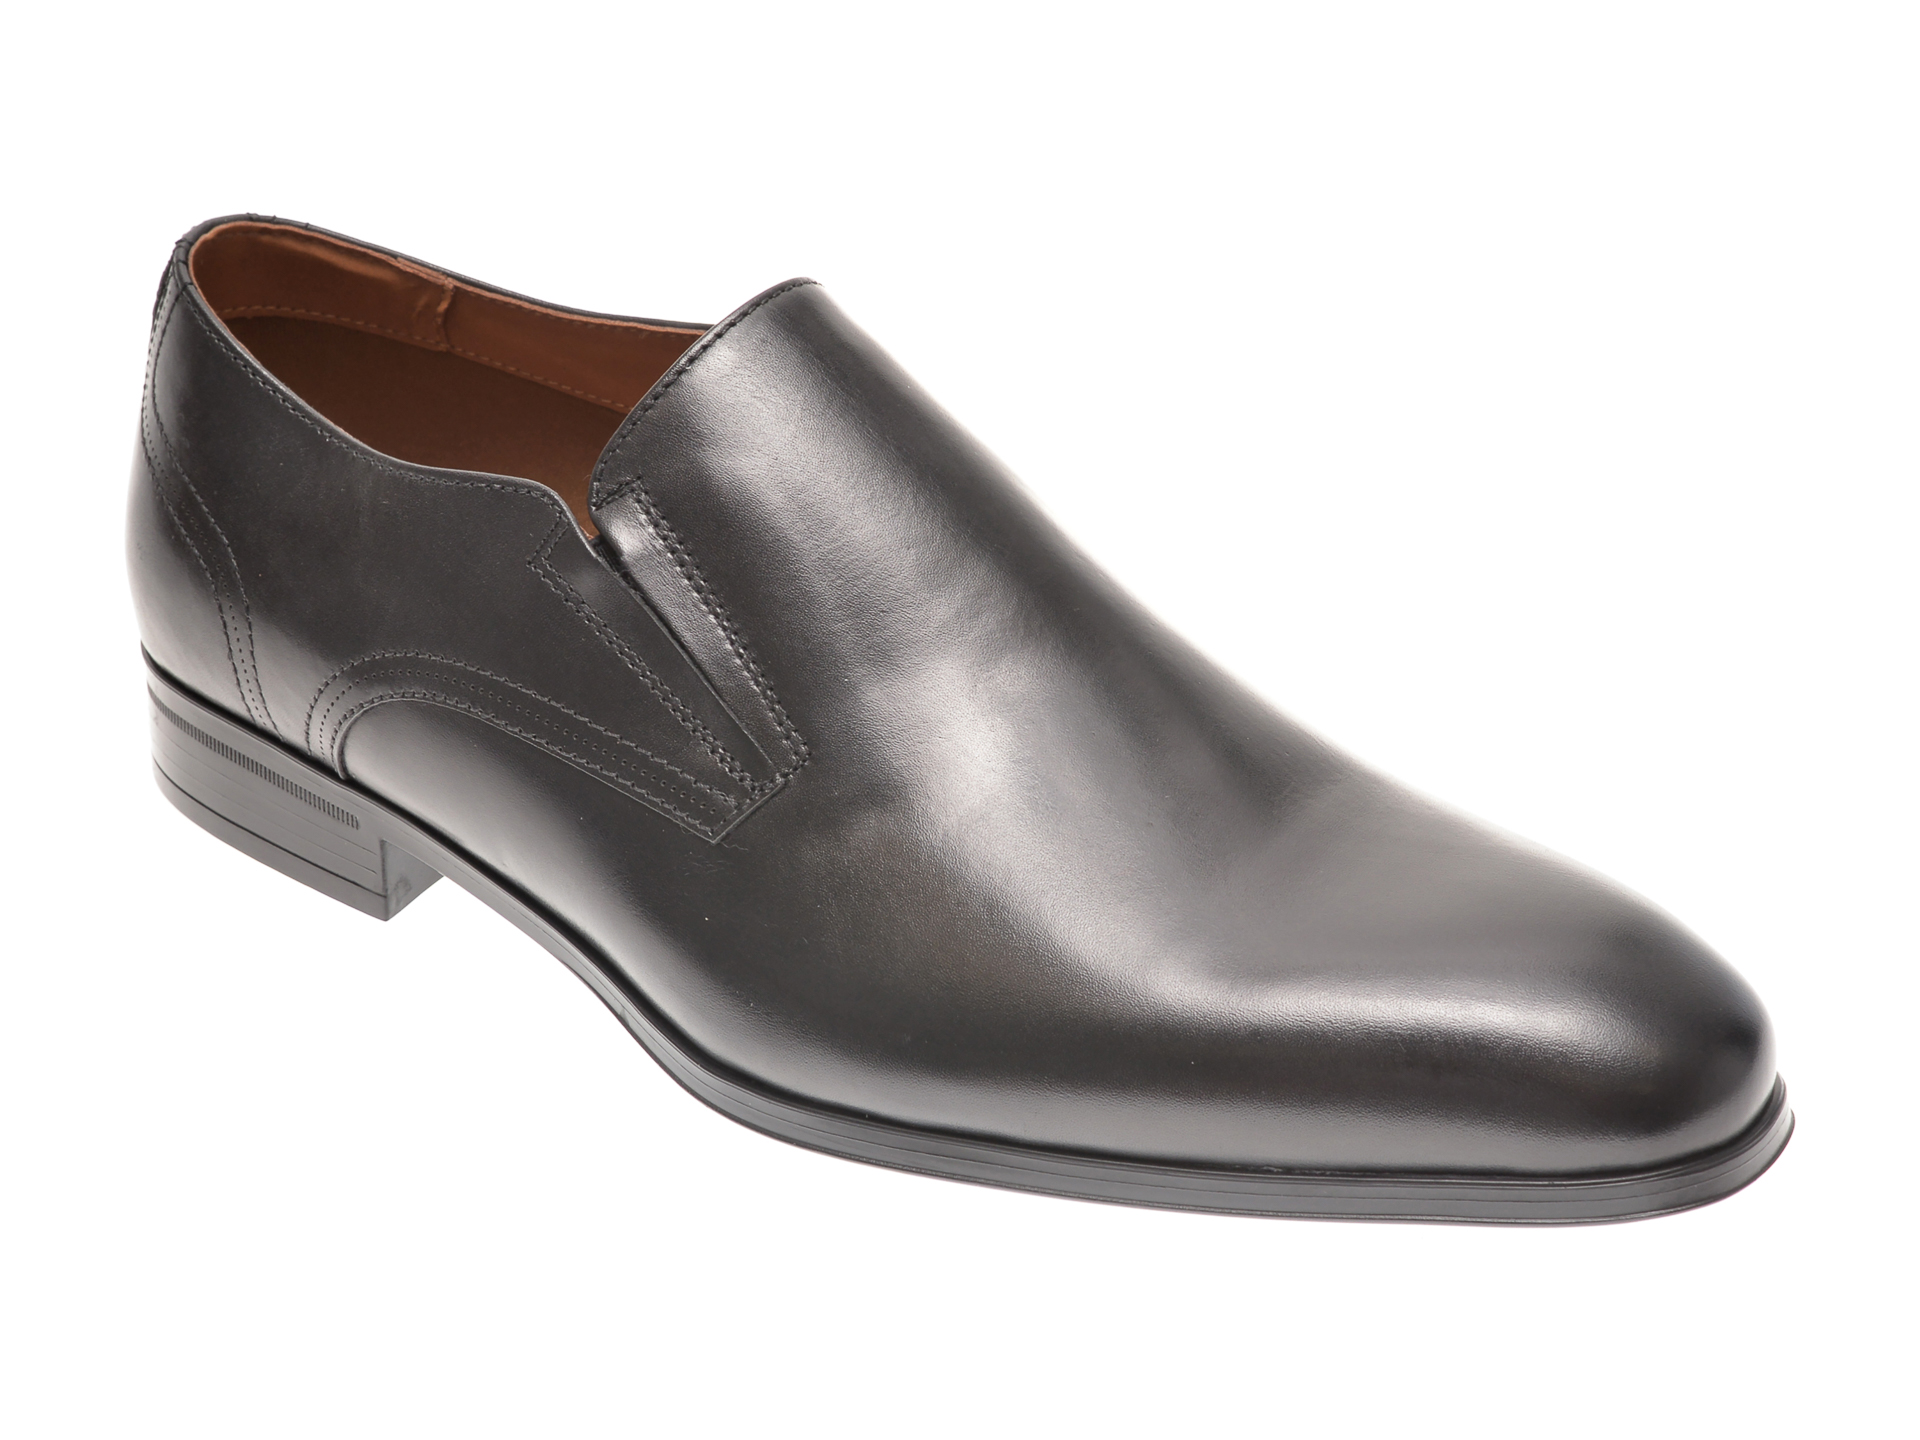 Pantofi ALDO negri, Hyogo001, din piele naturala imagine